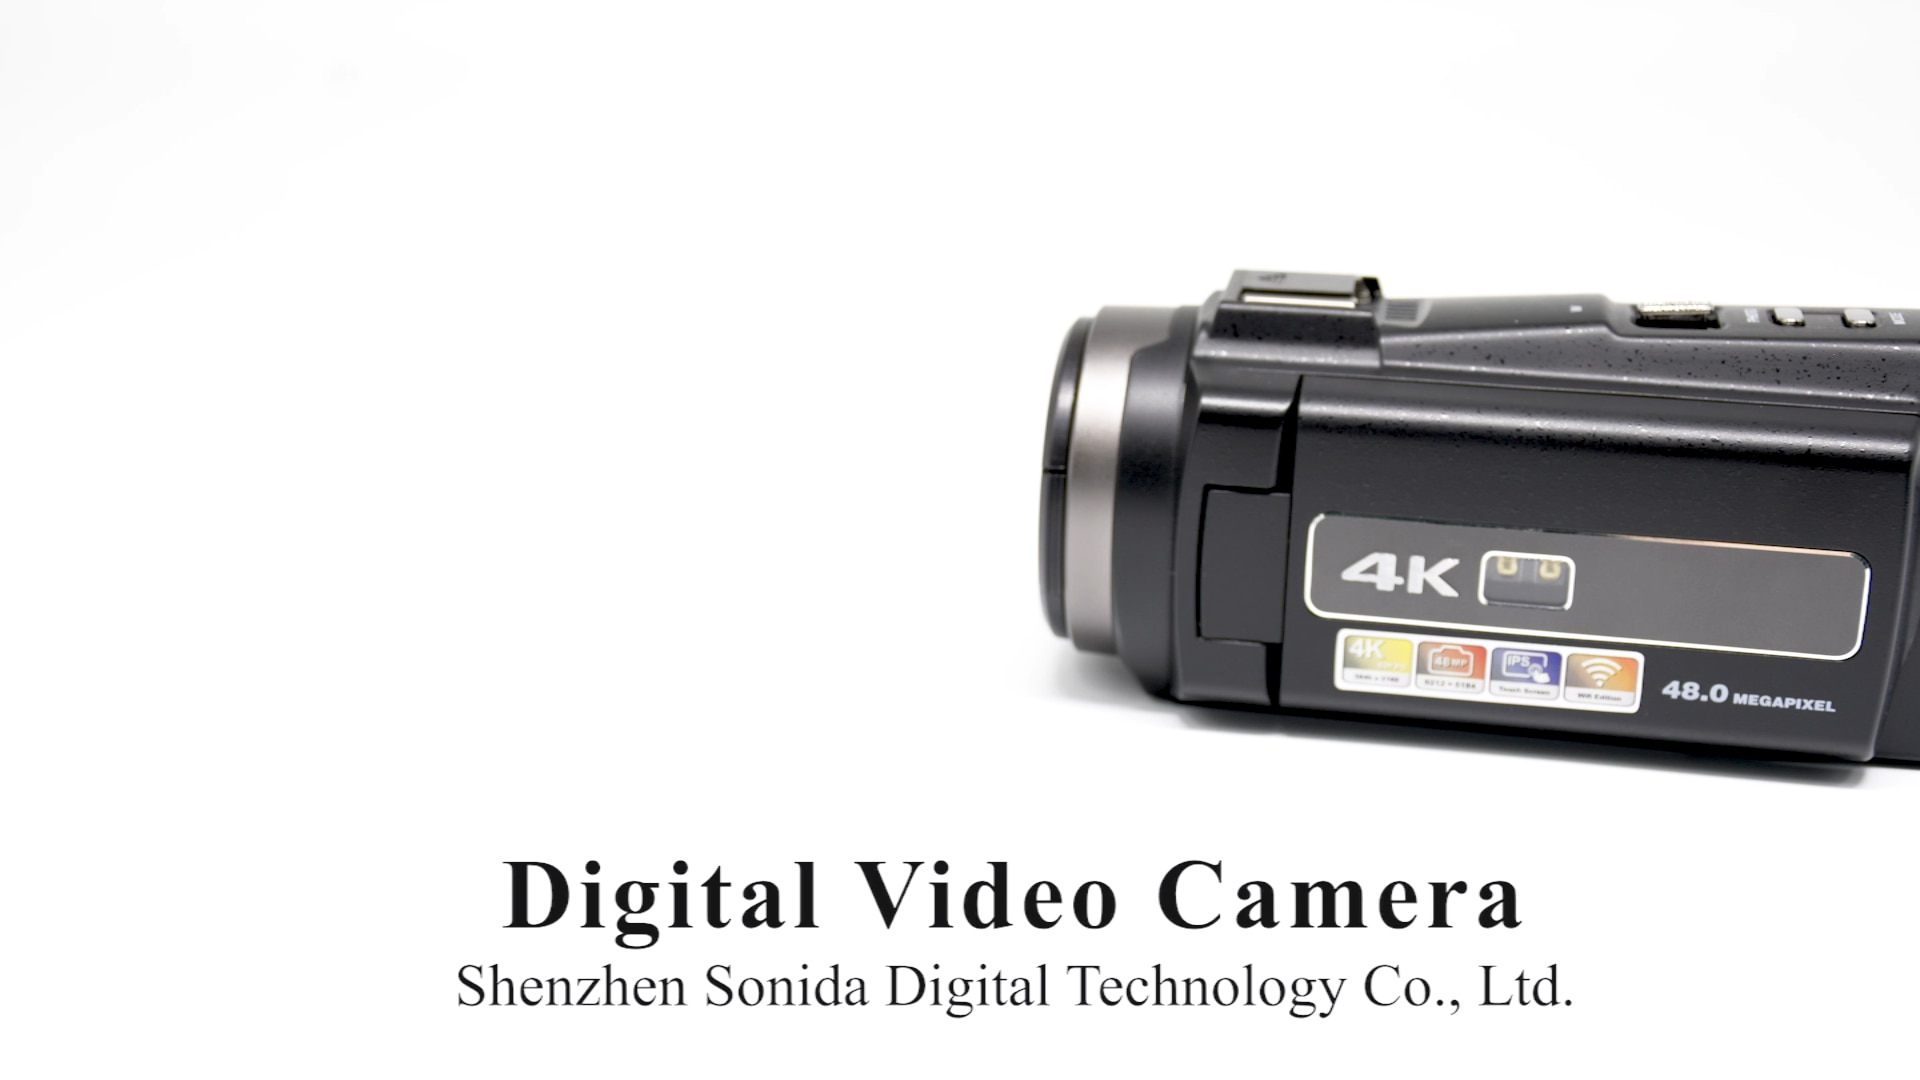 Cámara De vídeo Profesional 4K, videocámara Digital Ultra HD De 48MP